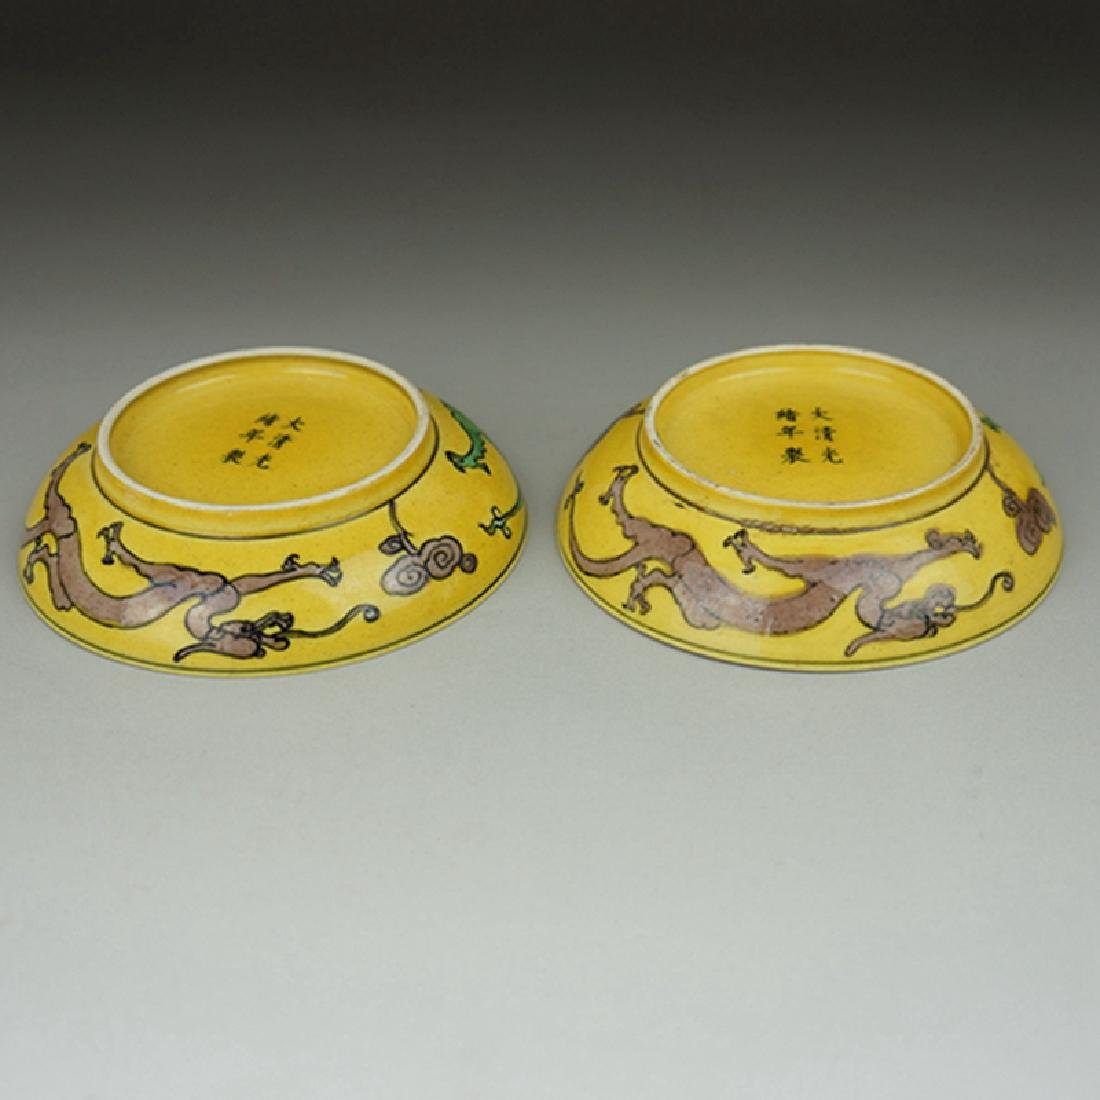 Pair Chinese Porcelain Plates Guangxu Mark - 3